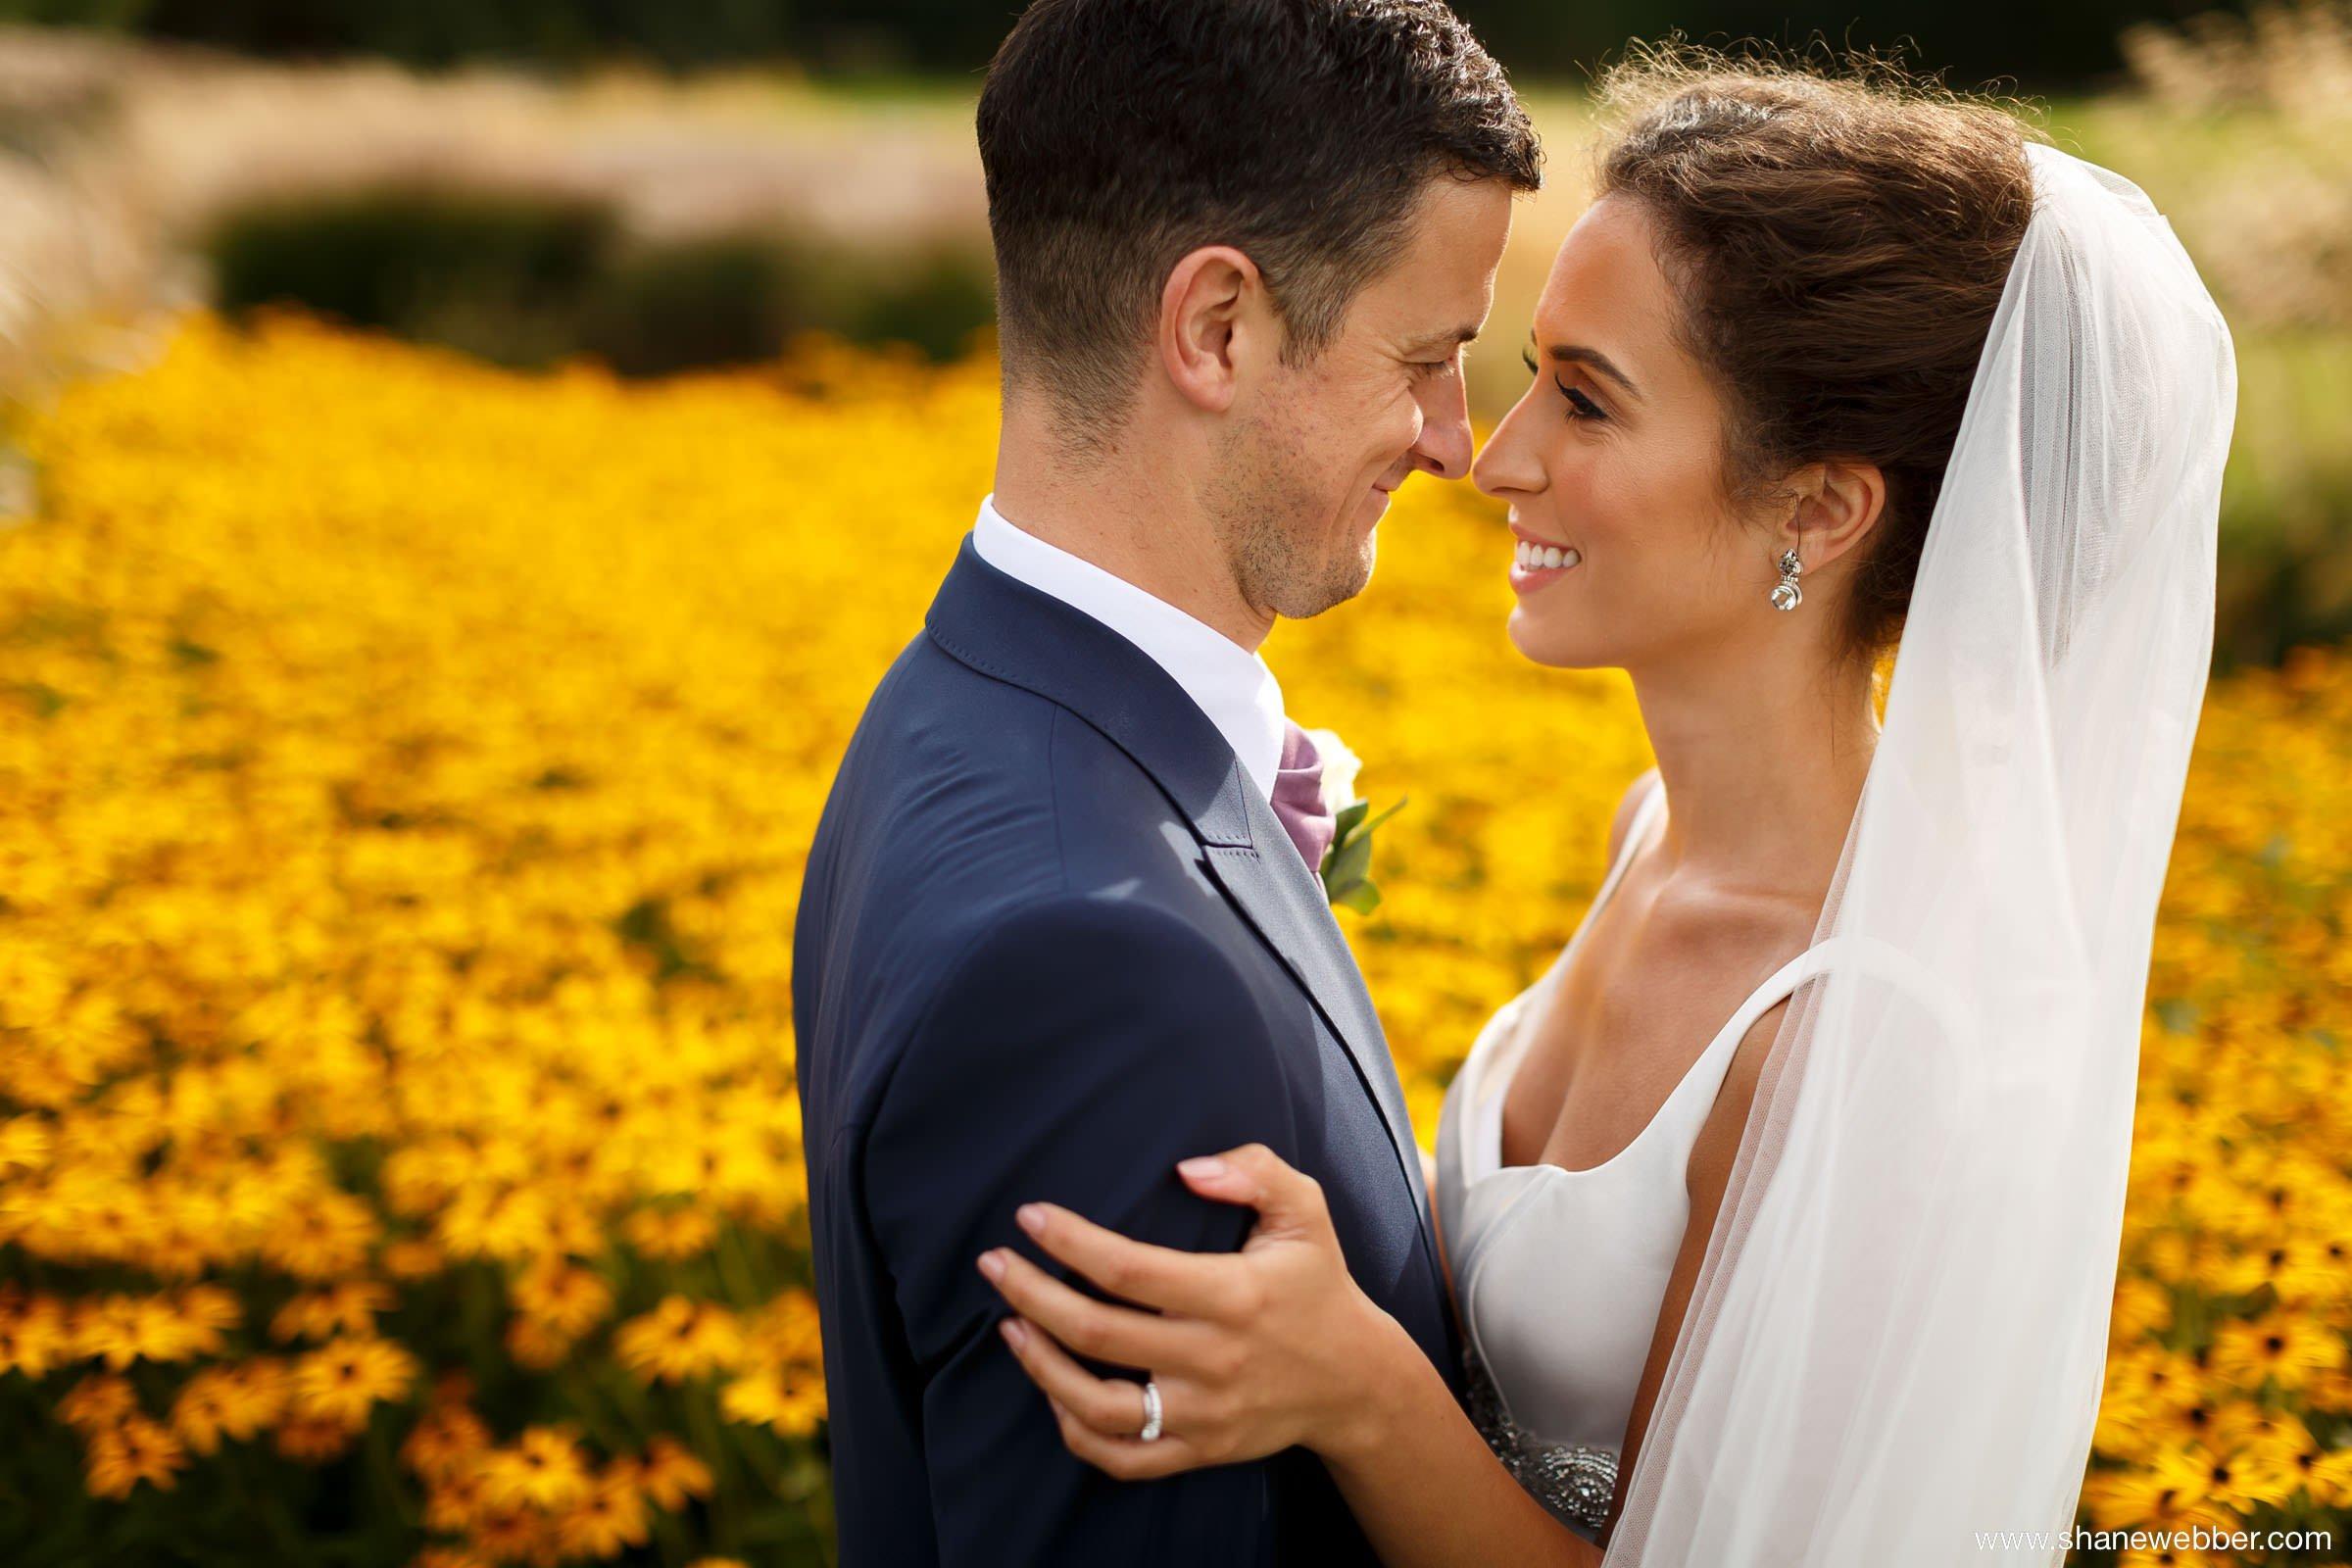 Colourful Wedding Photography at Abbeywood Estate